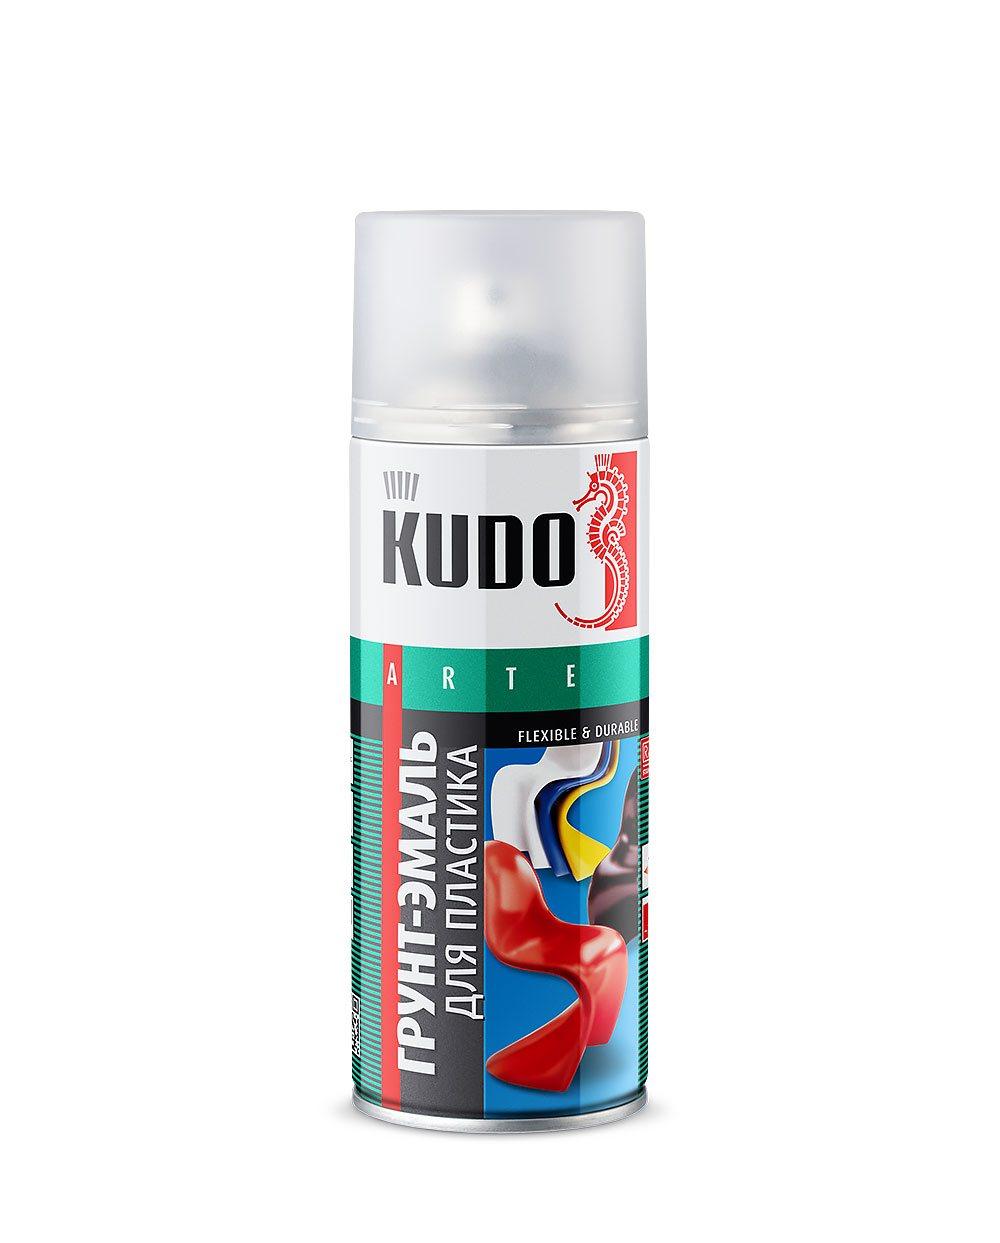 Грунт - эмаль для пластика Kudo серый аэрозоль 520 мл KU-6001